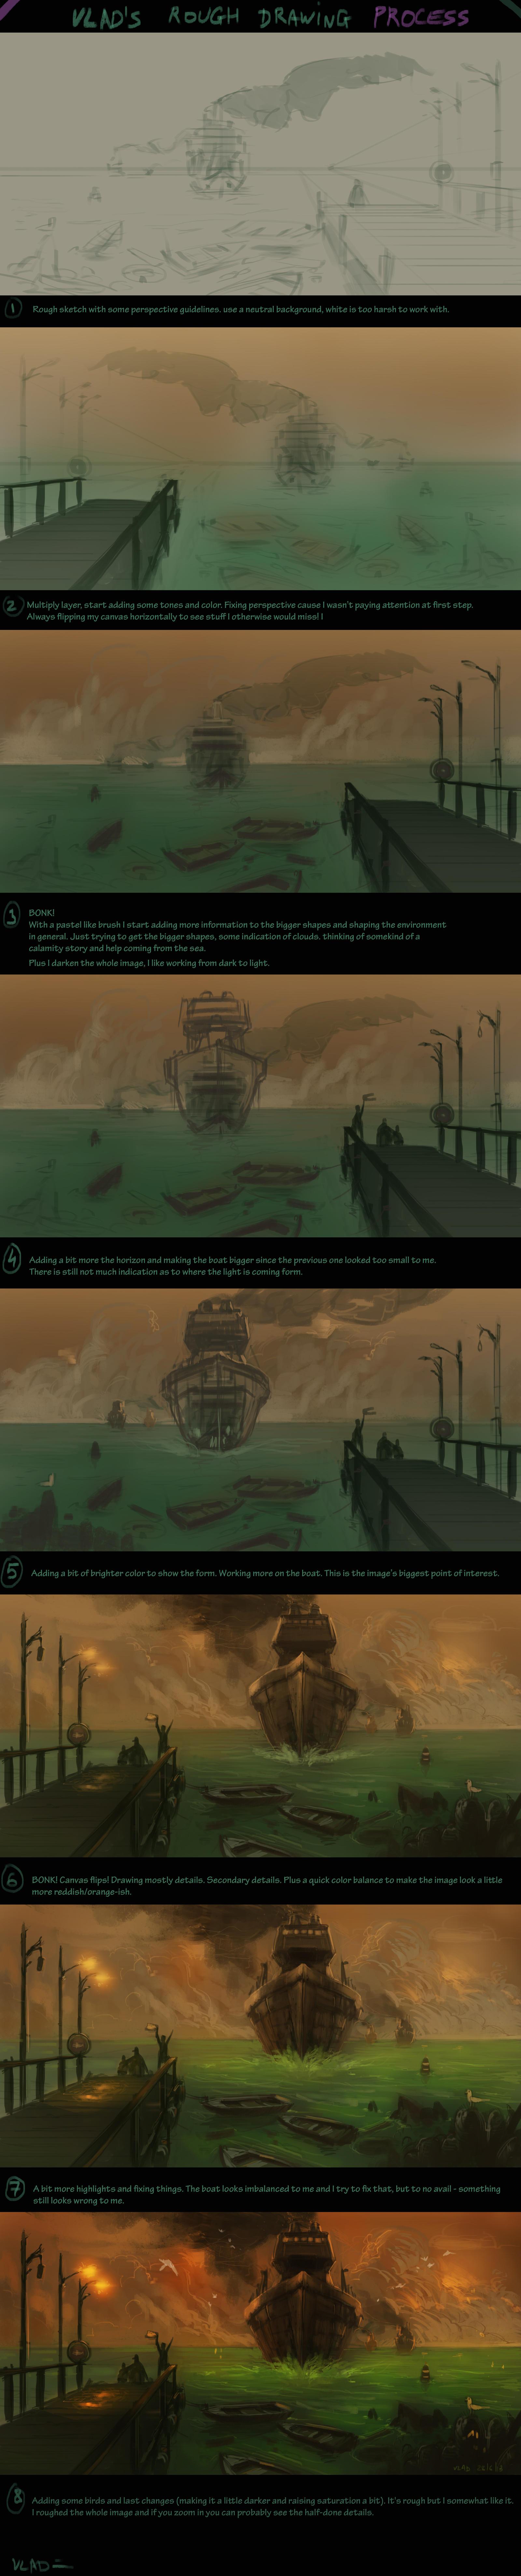 Tutorials by saltytowel on DeviantArt